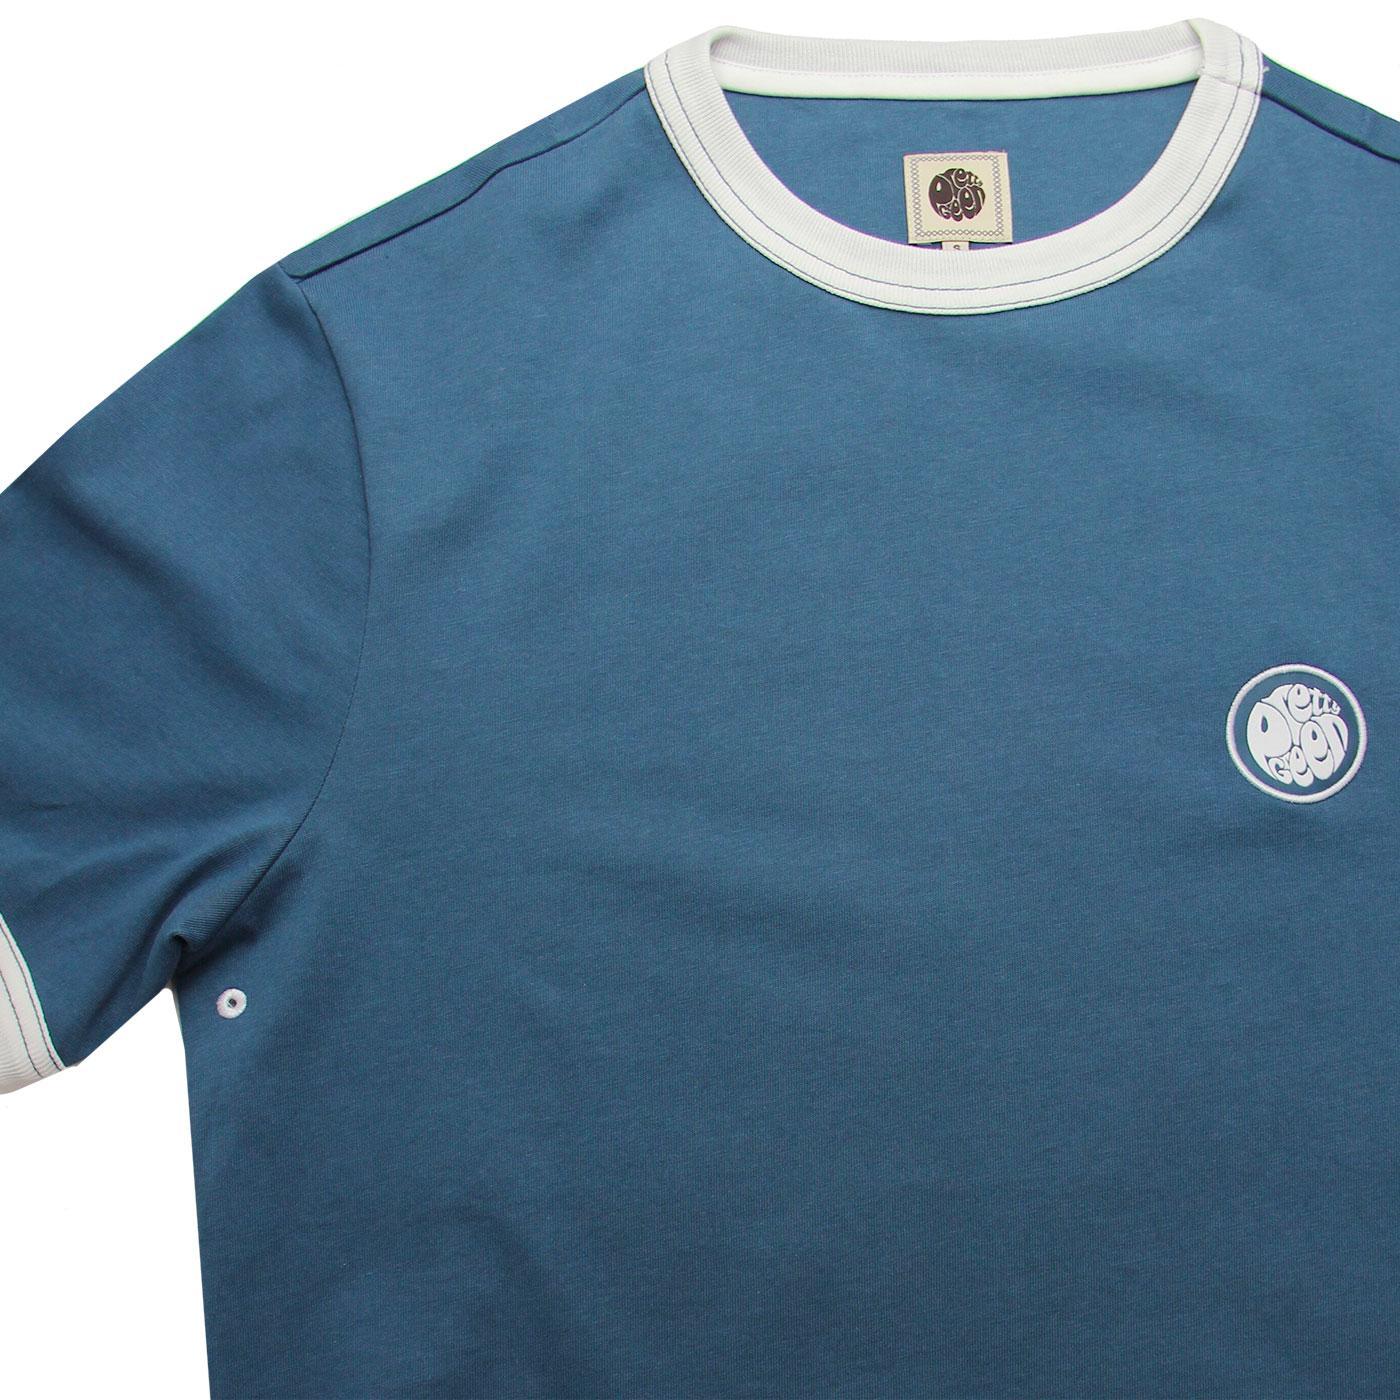 5b1663332d0 PRETTY GREEN Retro Sixties Badge Ringer Tee in Blue